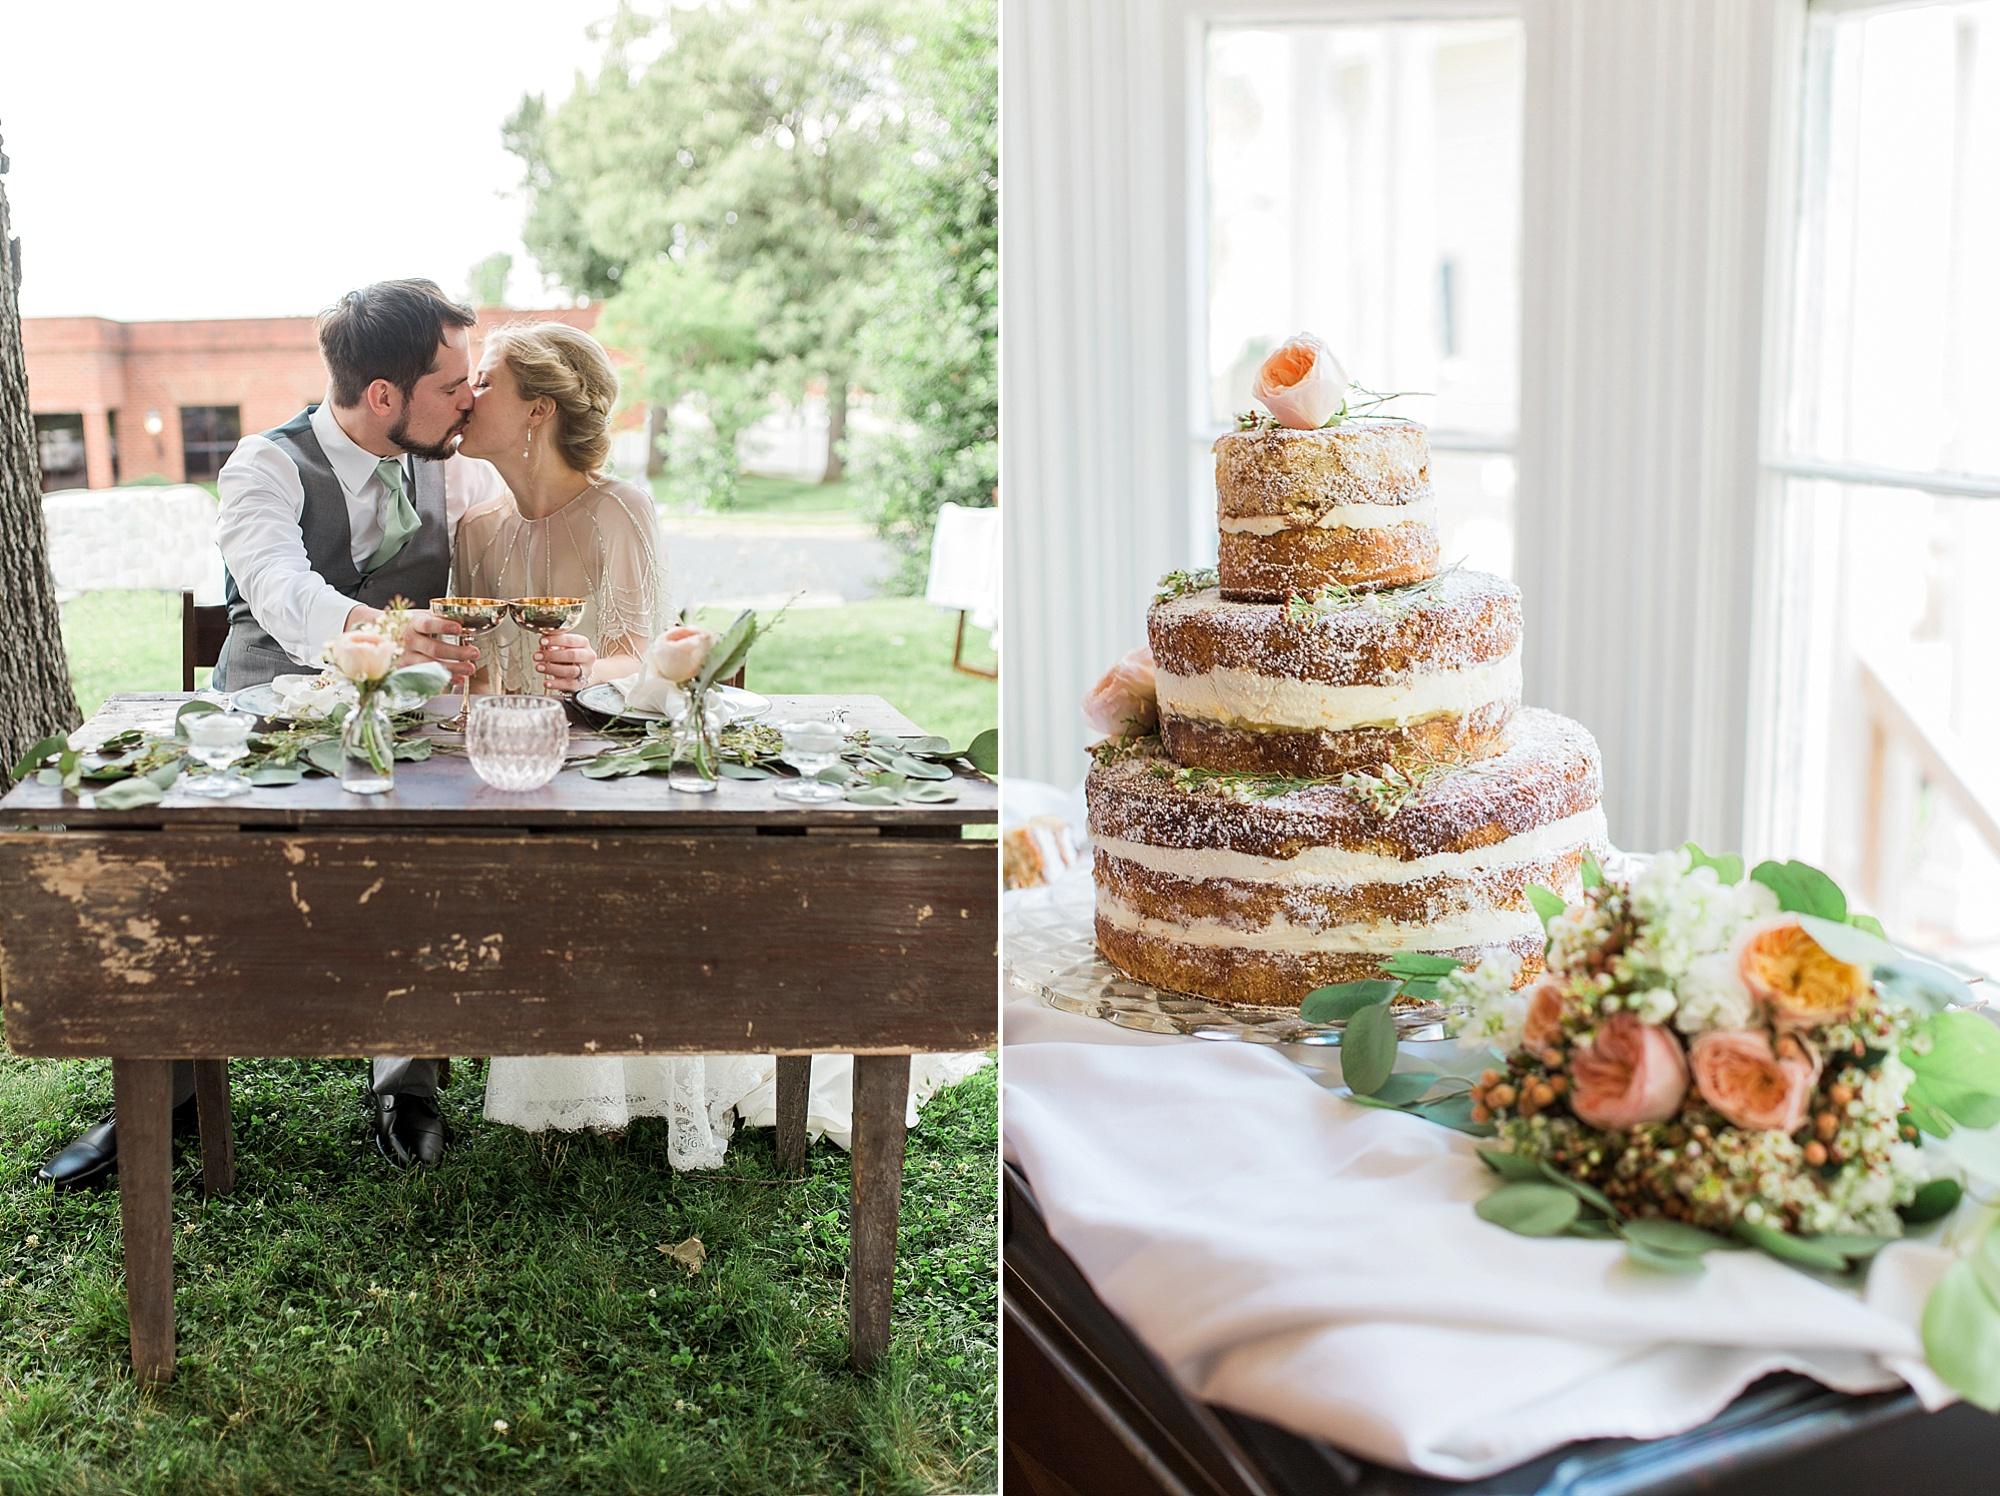 Weir-Jordan House Wedding